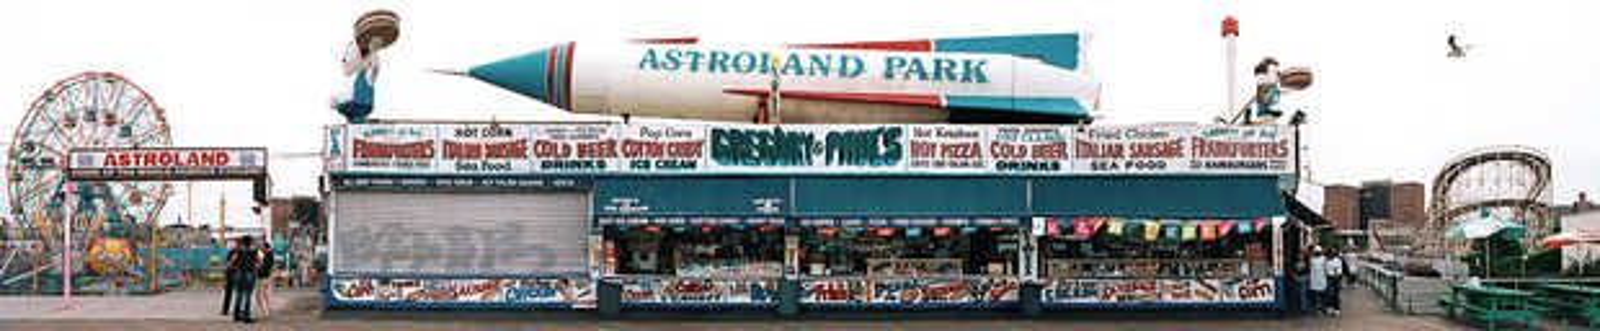 Astroland Park, Coney Island - James & Karla Murray